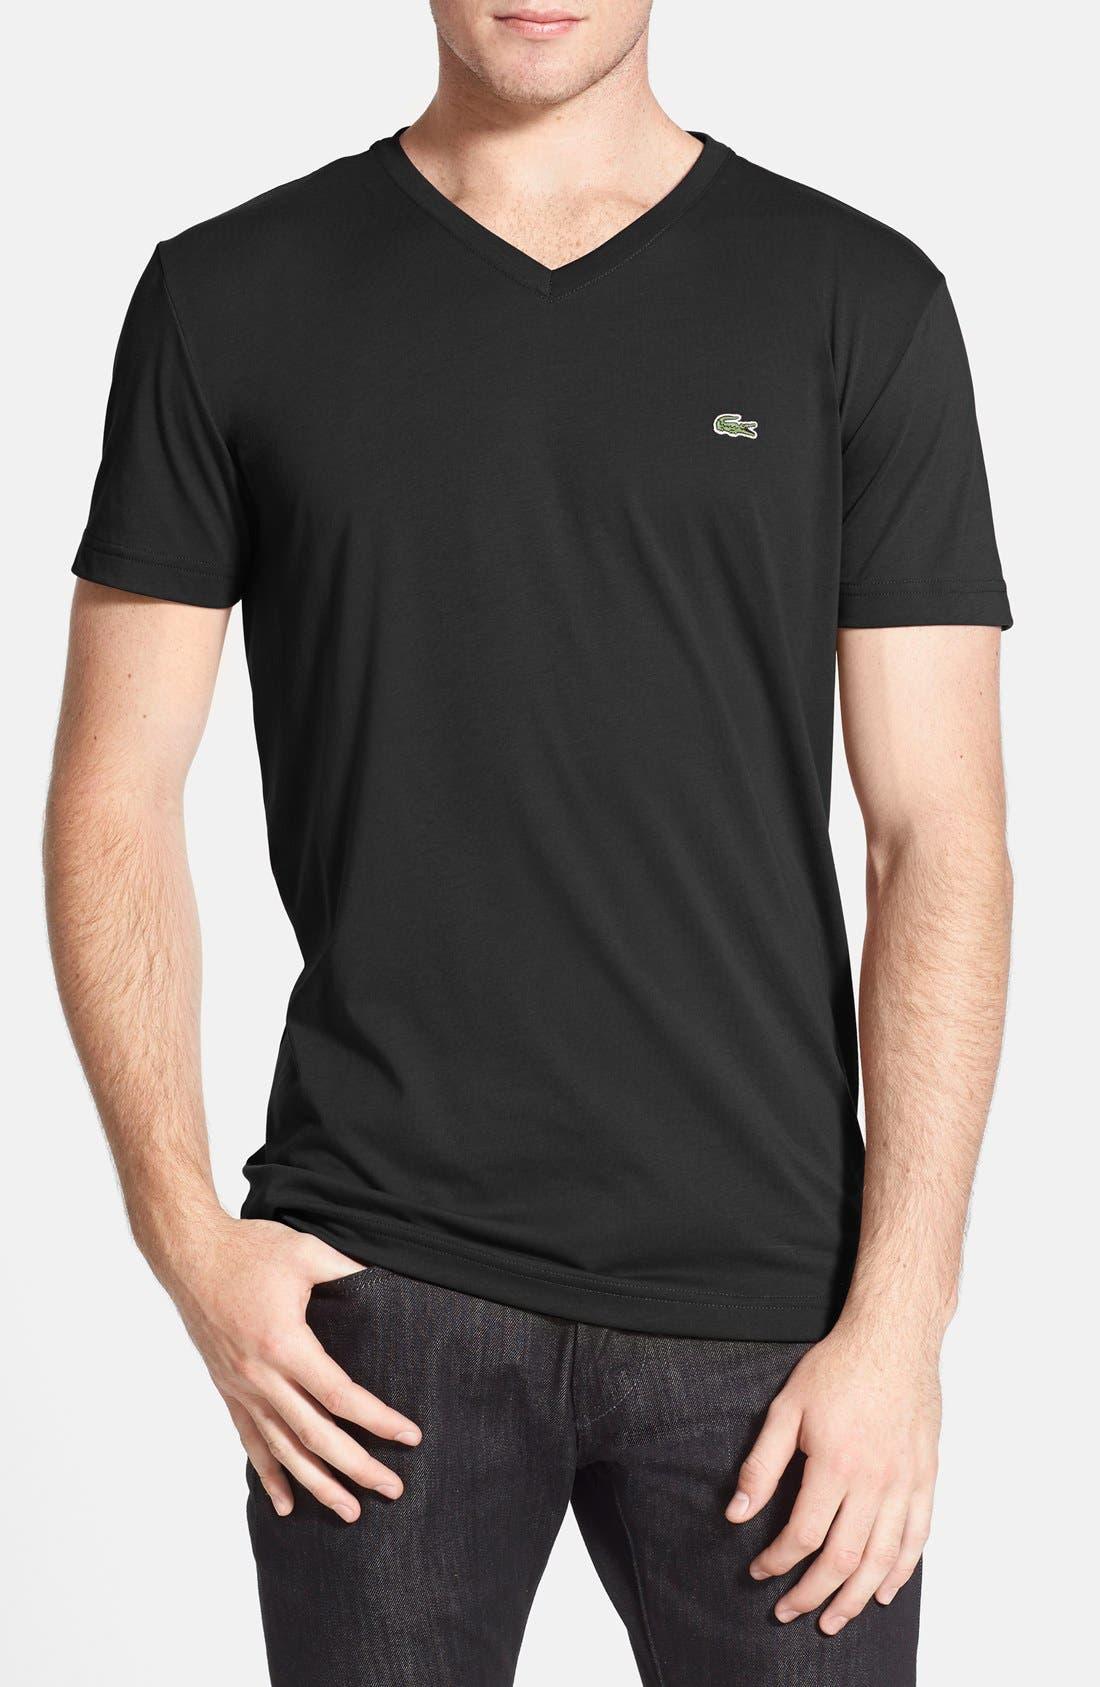 Alternate Image 1 Selected - Lacoste Pima Cotton Jersey V-Neck T-Shirt